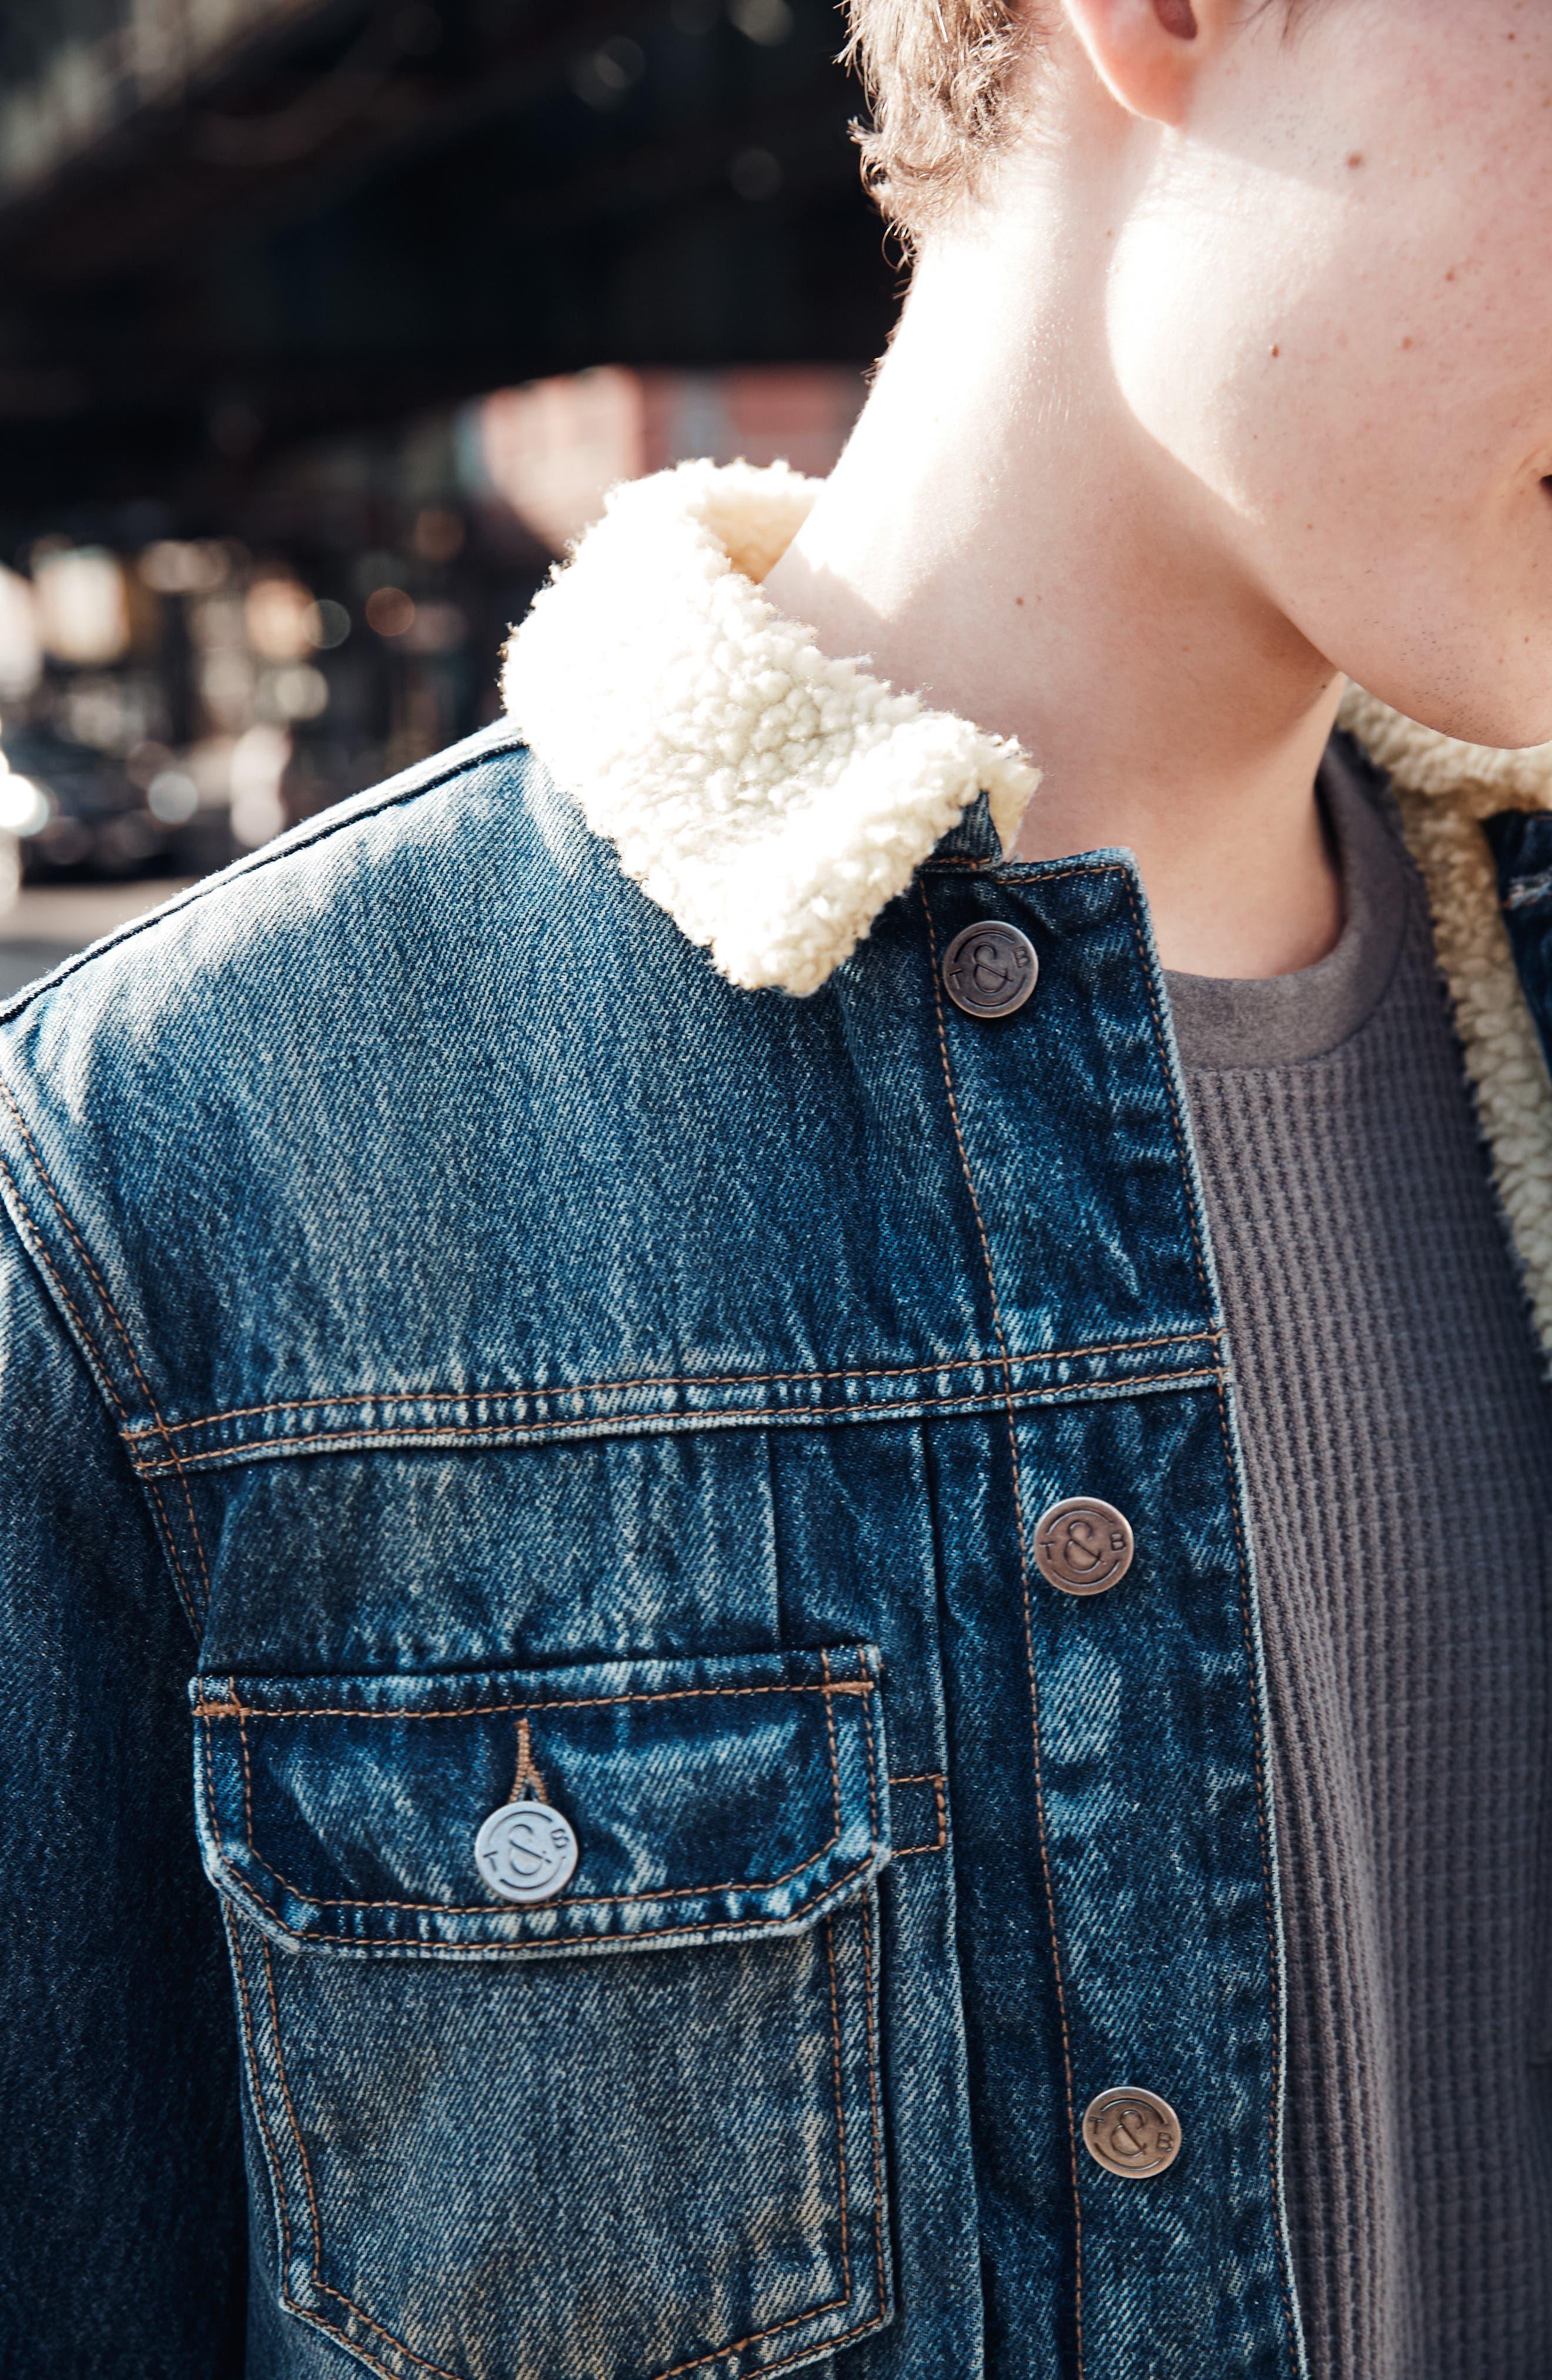 Denim Jacket with Faux Shearling Collar,                             Alternate thumbnail 10, color,                             BLUE MEDIUM DENIM